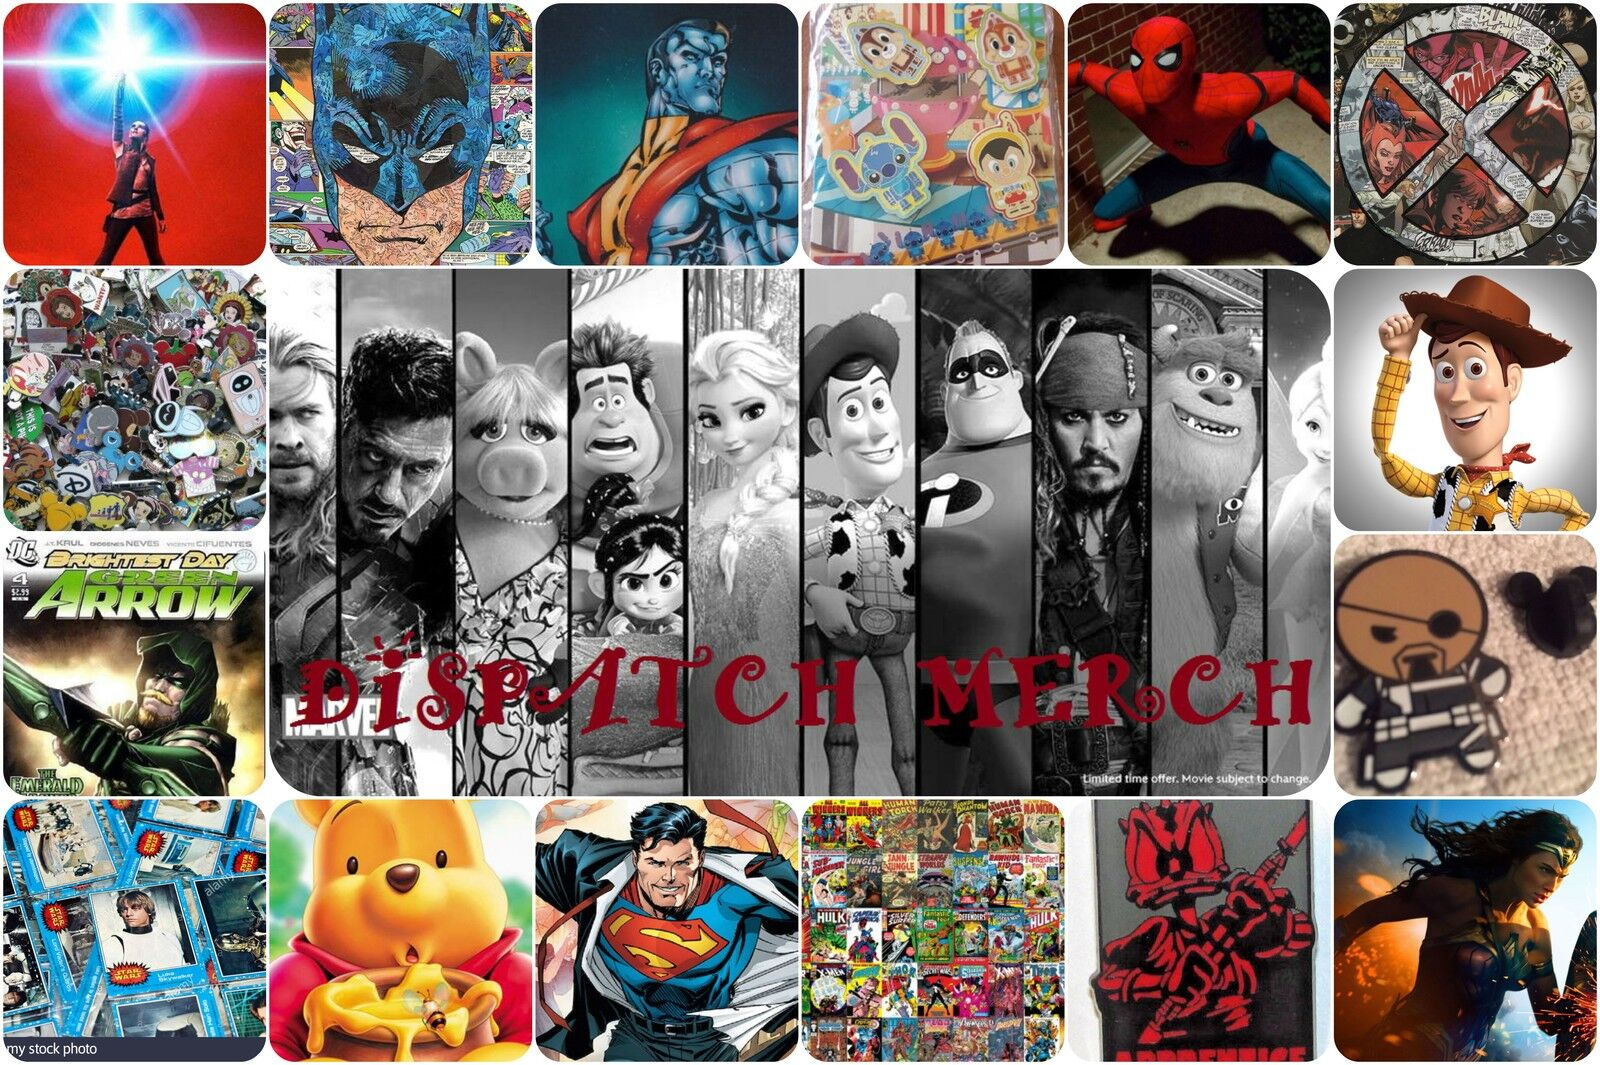 Dispatch Merch